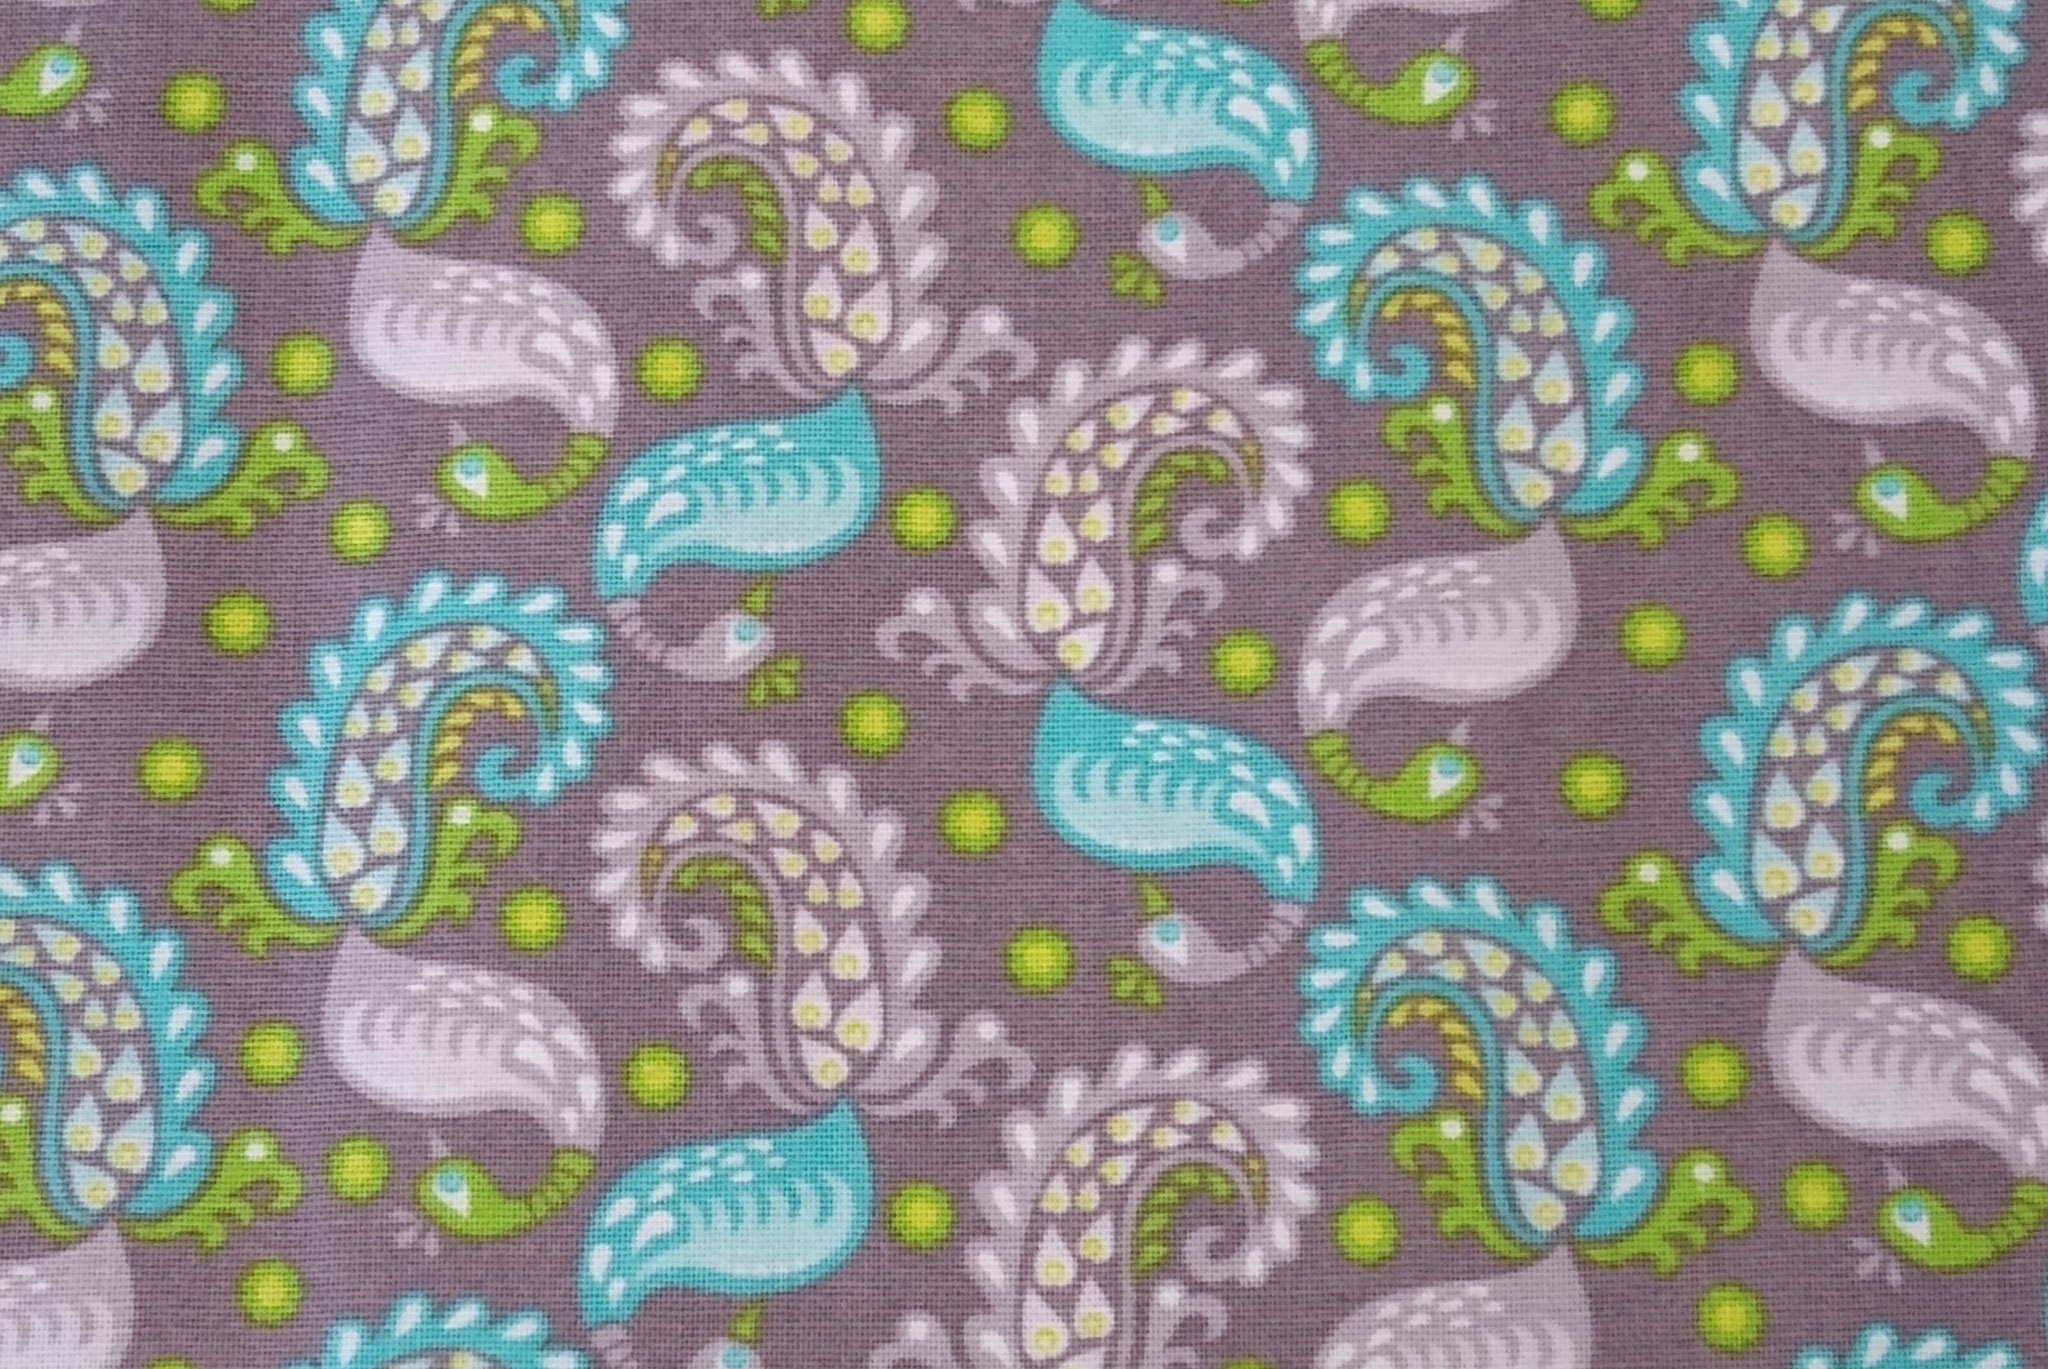 Baumwolle Paisley, grau, 110cm breit, 0.5m 8.50€